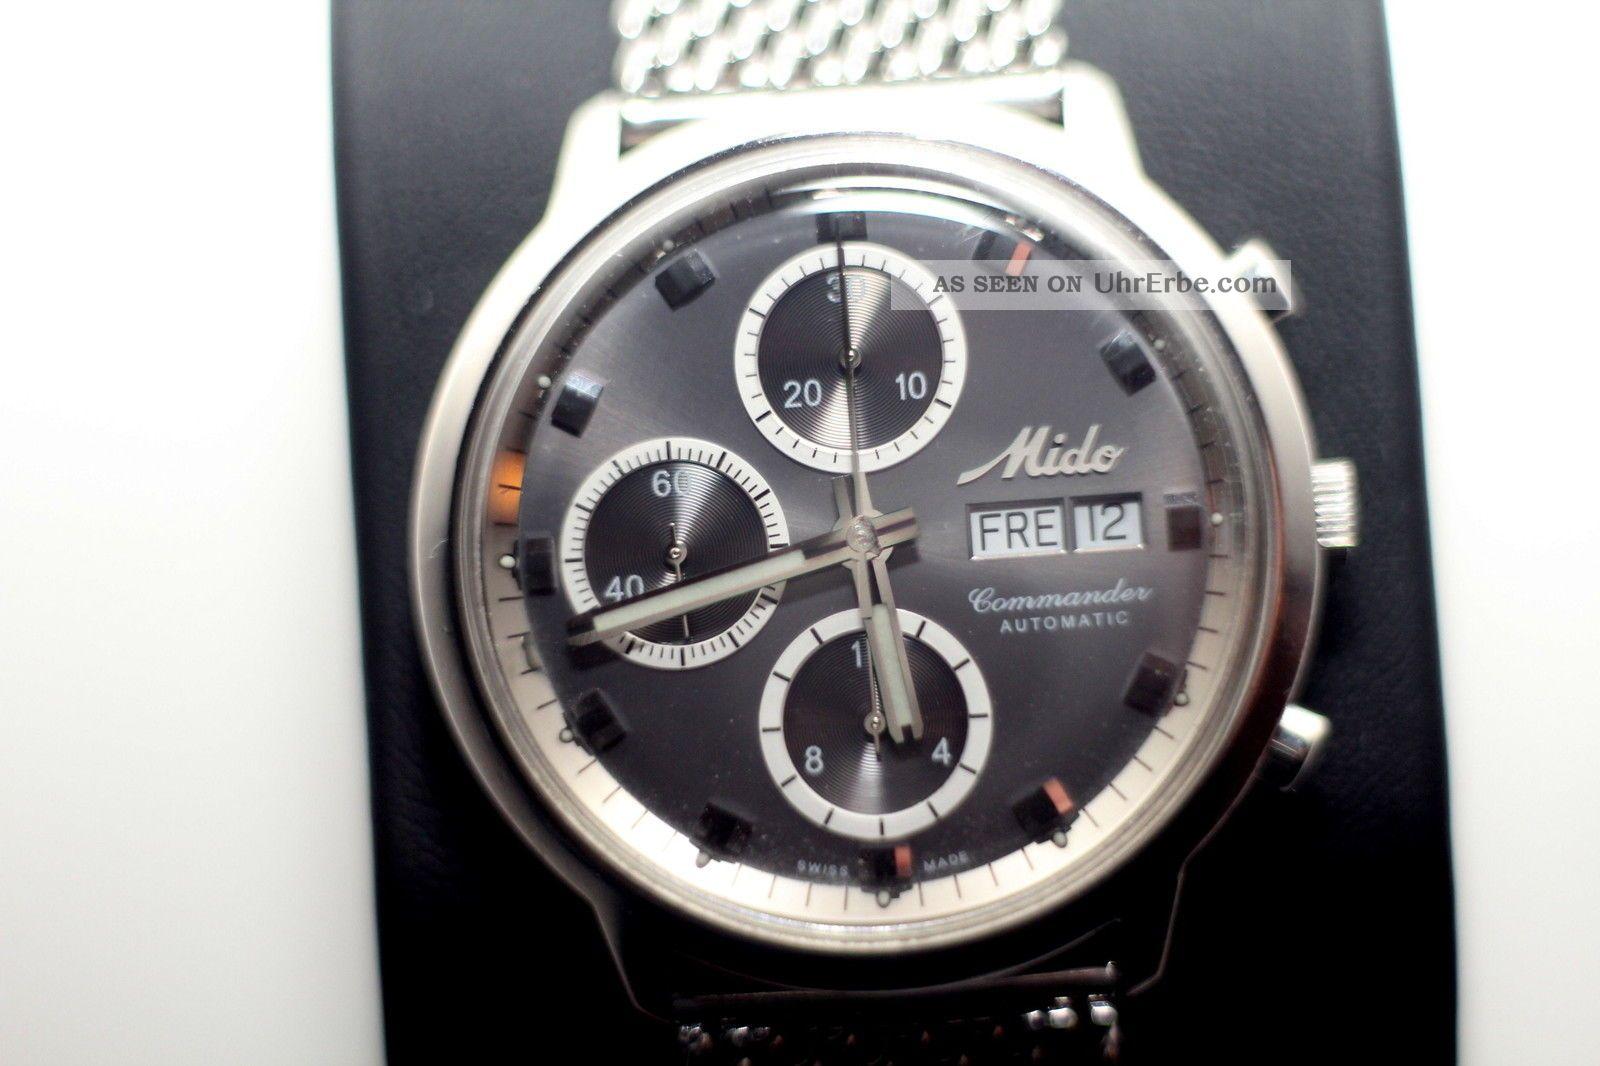 Mido Commander Automatic - Chronograph Valjoux 7750 Armbanduhren Bild